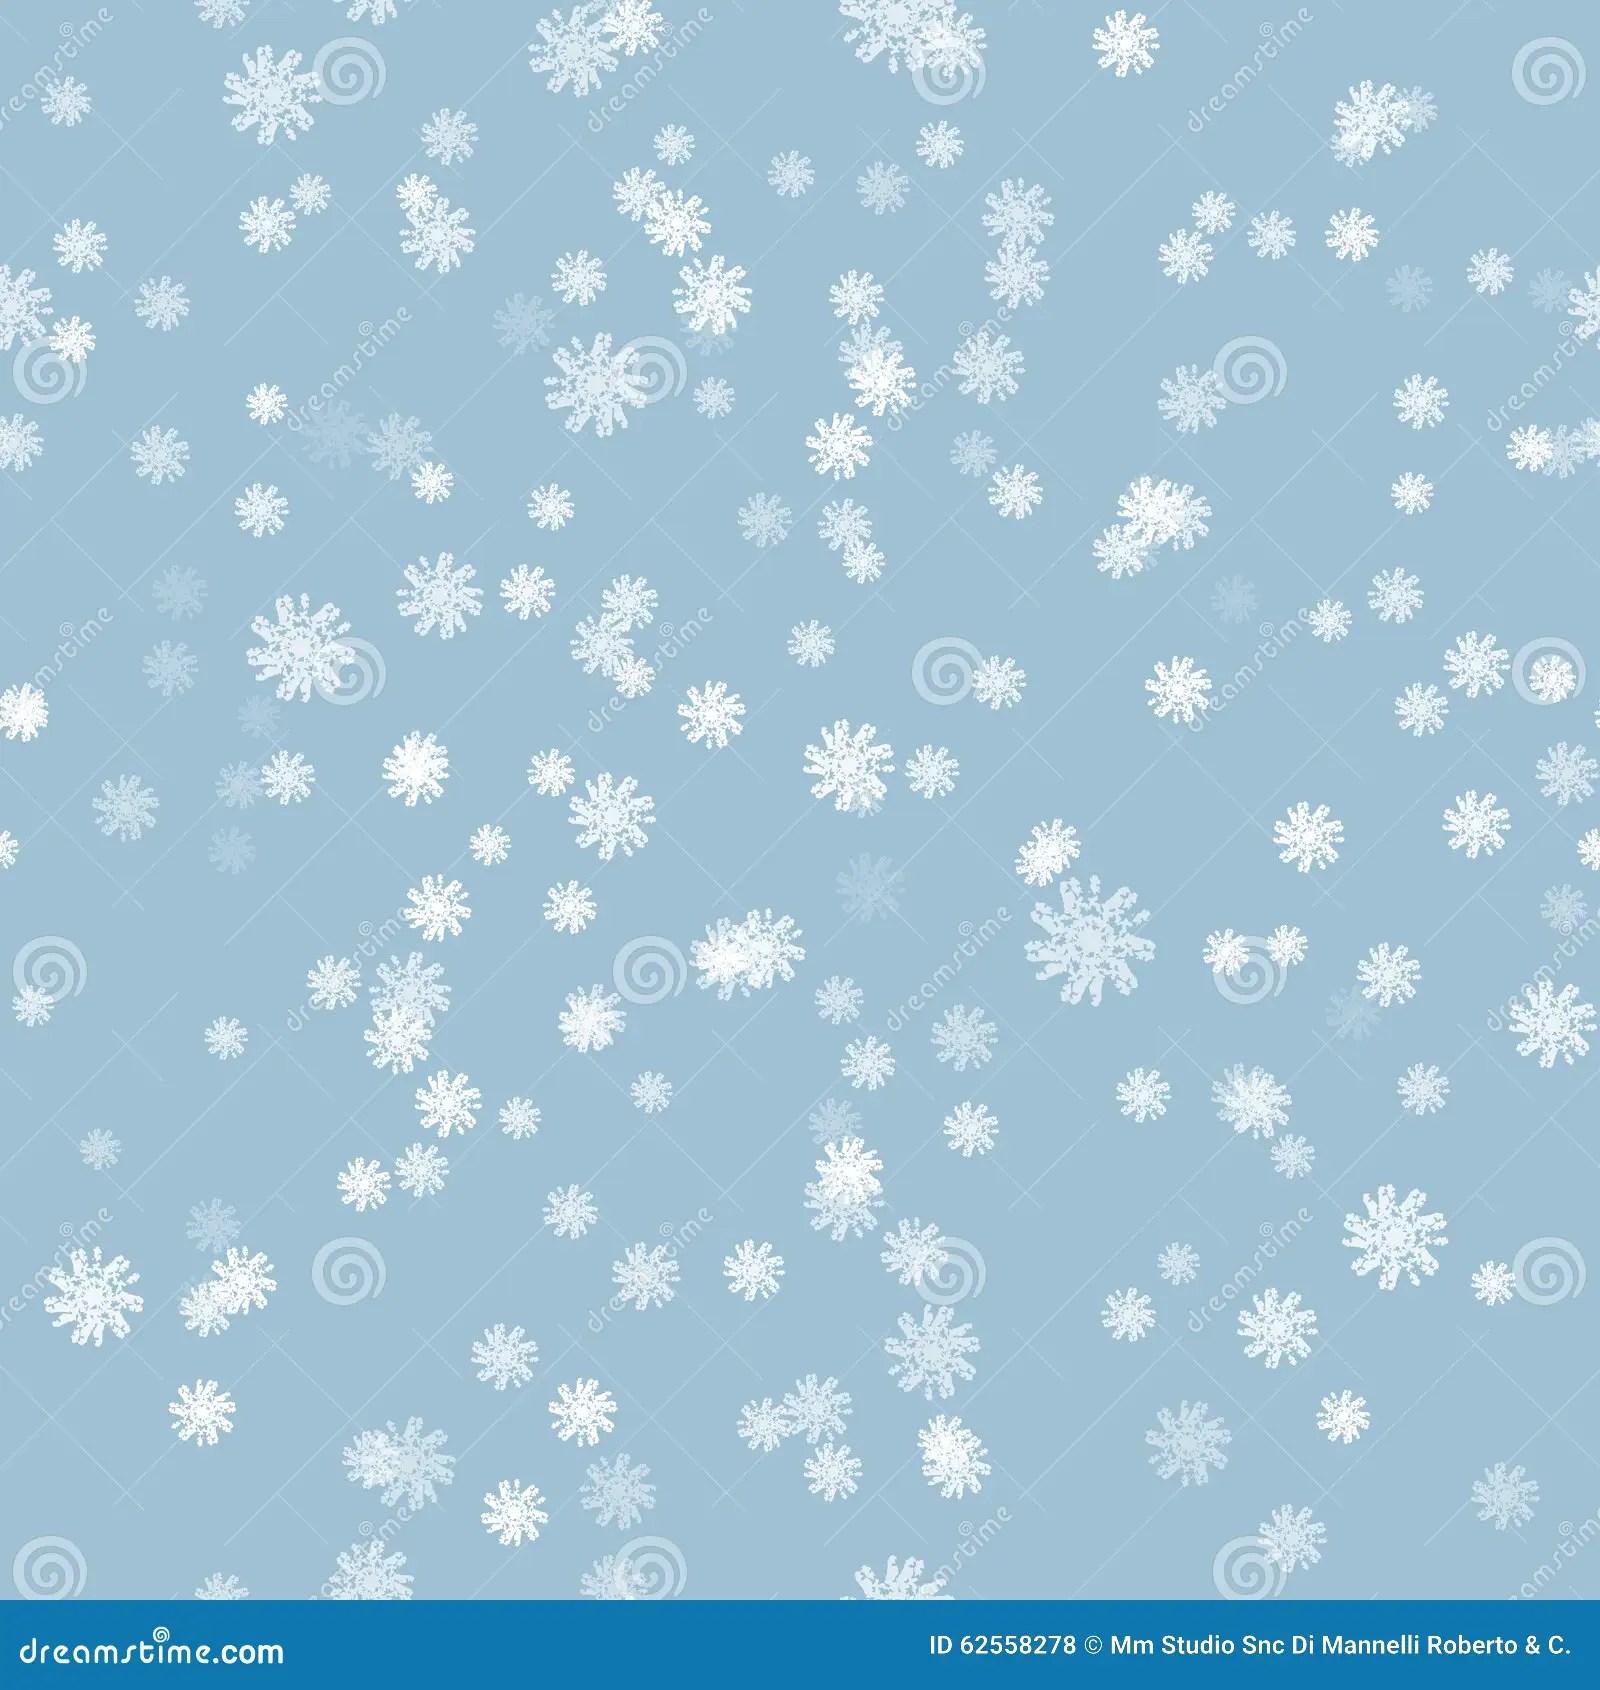 Free Falling Snow Wallpaper Winter Snow Brush Seamless Pattern Stock Vector Image